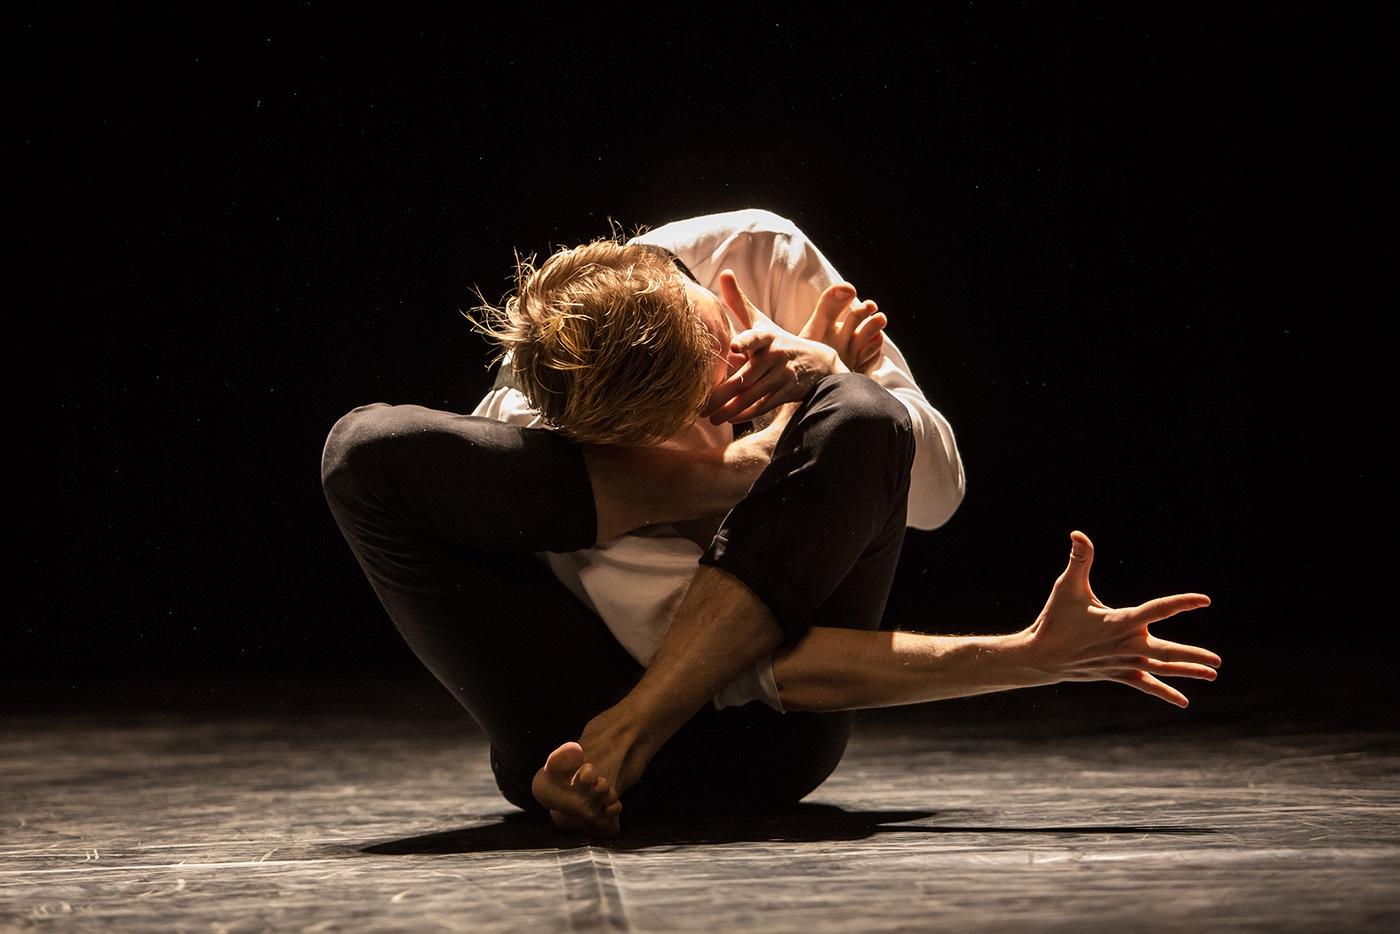 photographe-reportage-danse-avec-ton-crous-guillaume-heraud-012-small